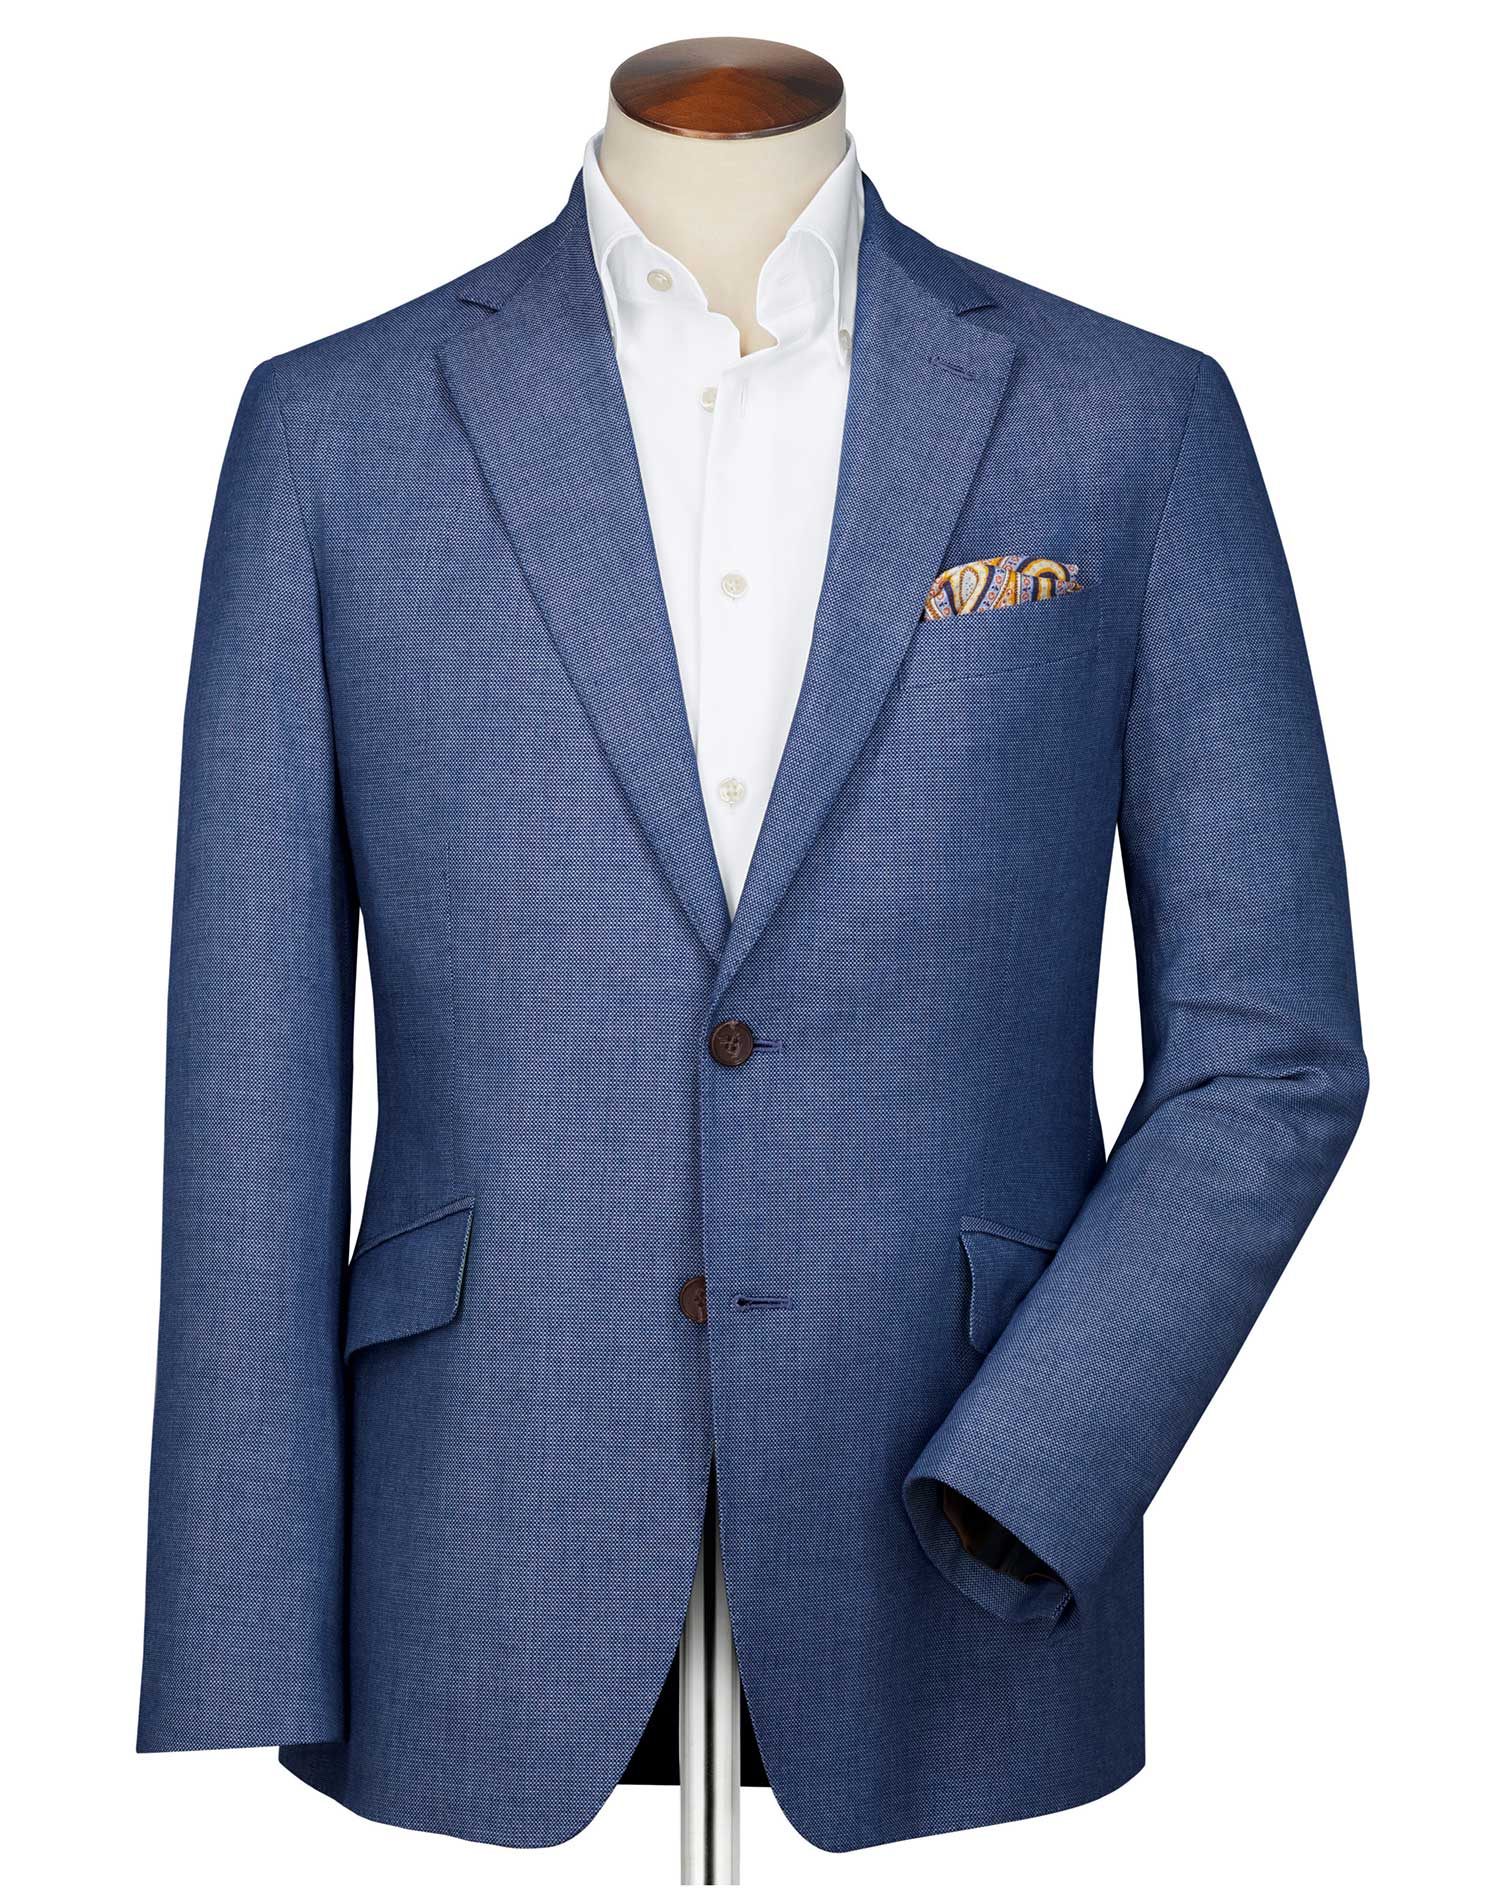 Slim Fit Light Blue Italian Wool Wool Blazer Size 36 Regular by Charles Tyrwhitt